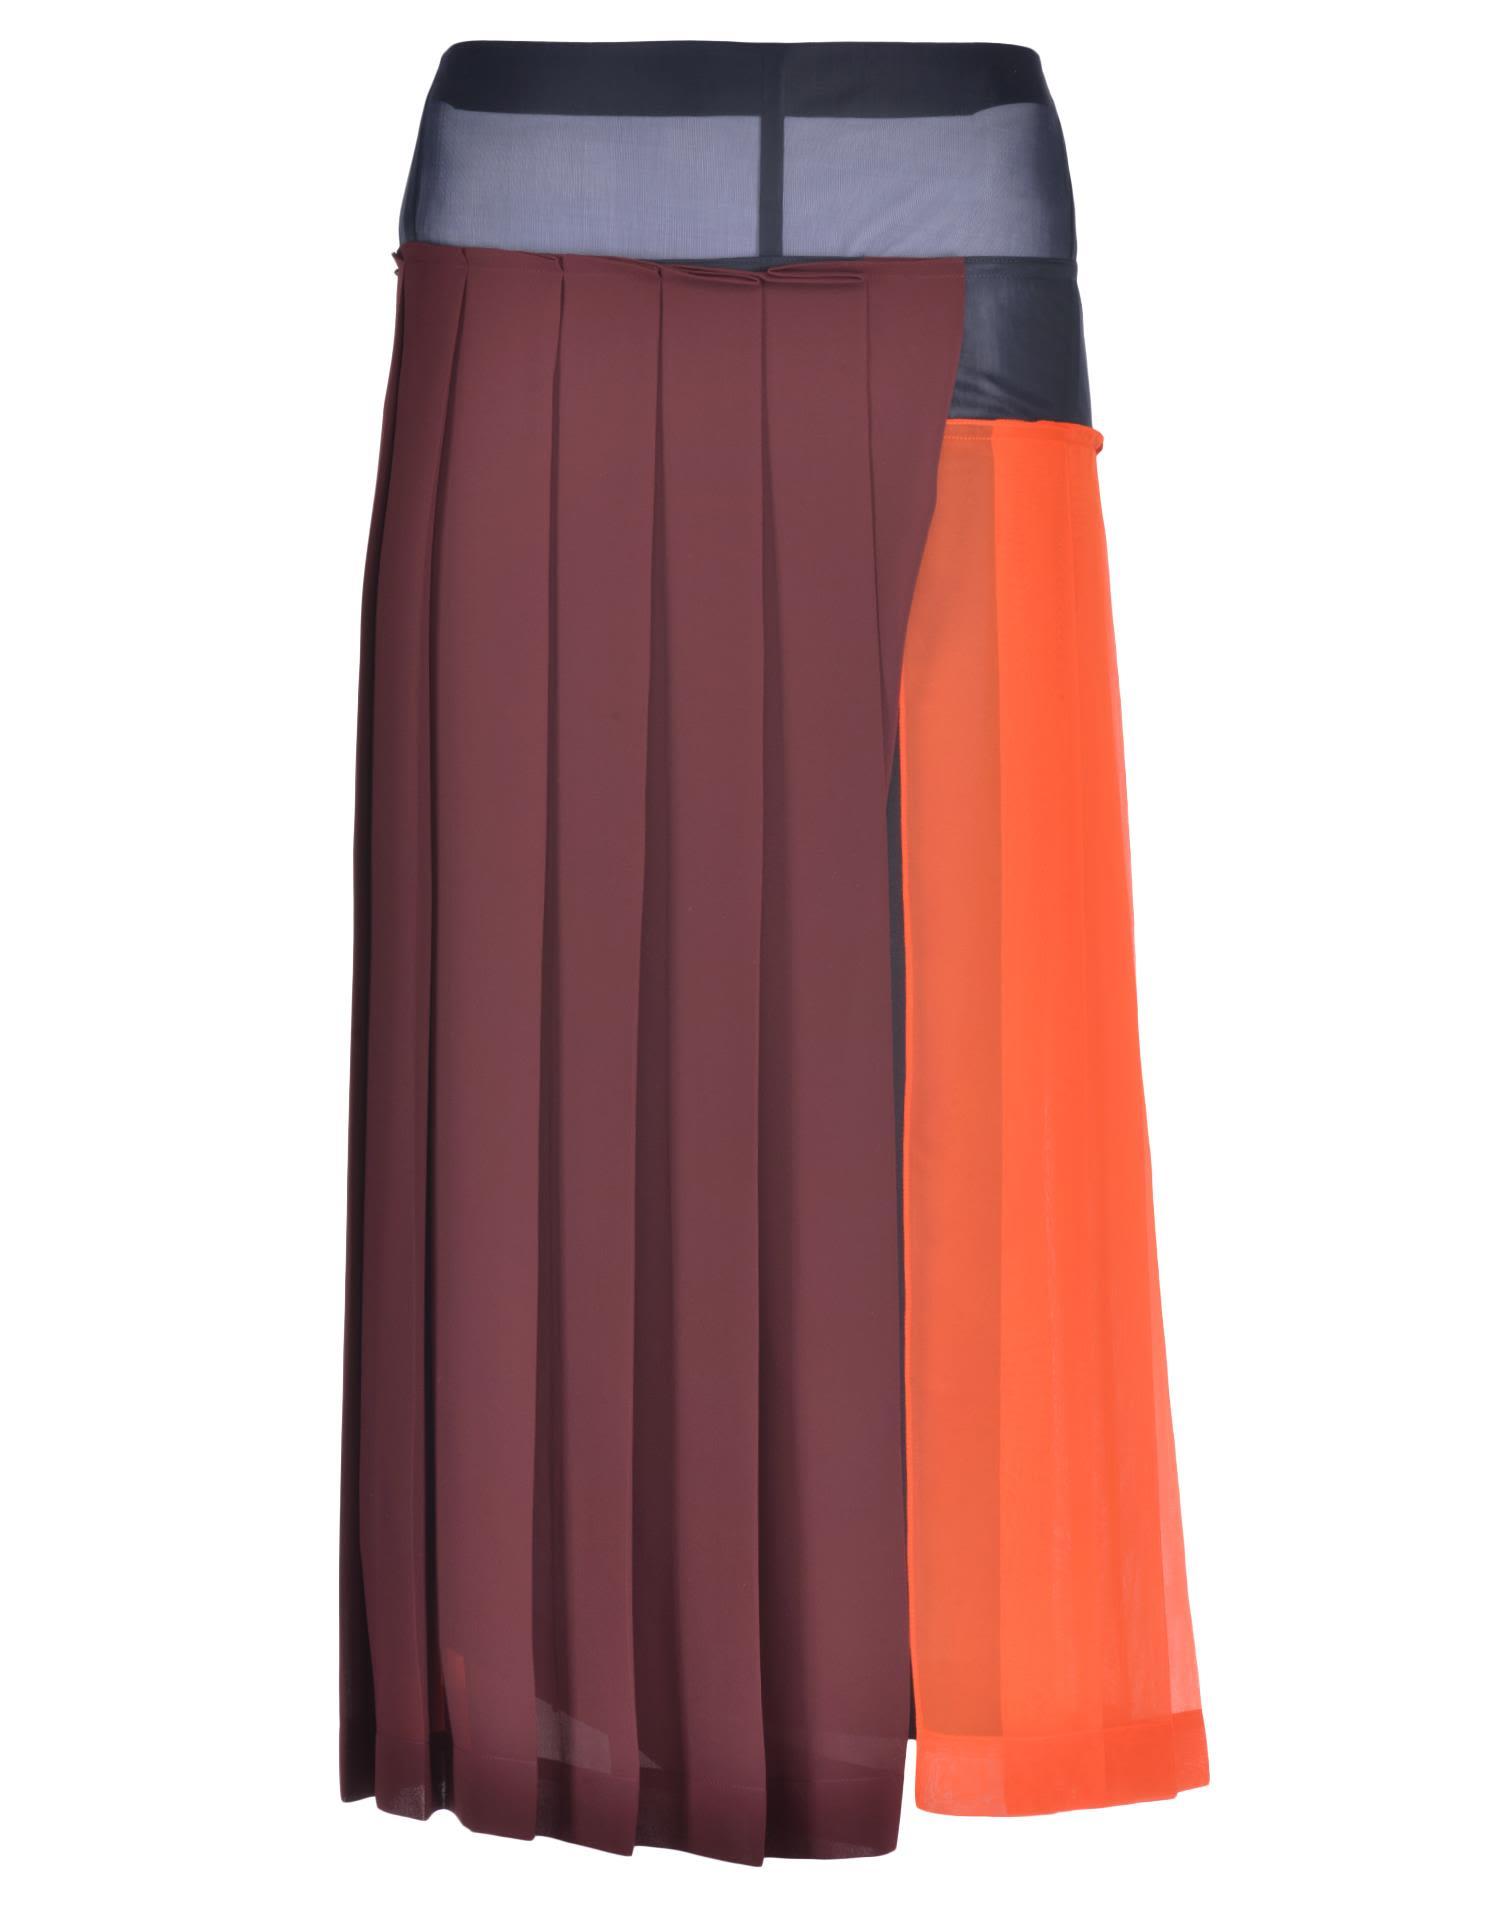 Victoria Beckham Georgette Pleated Skirt